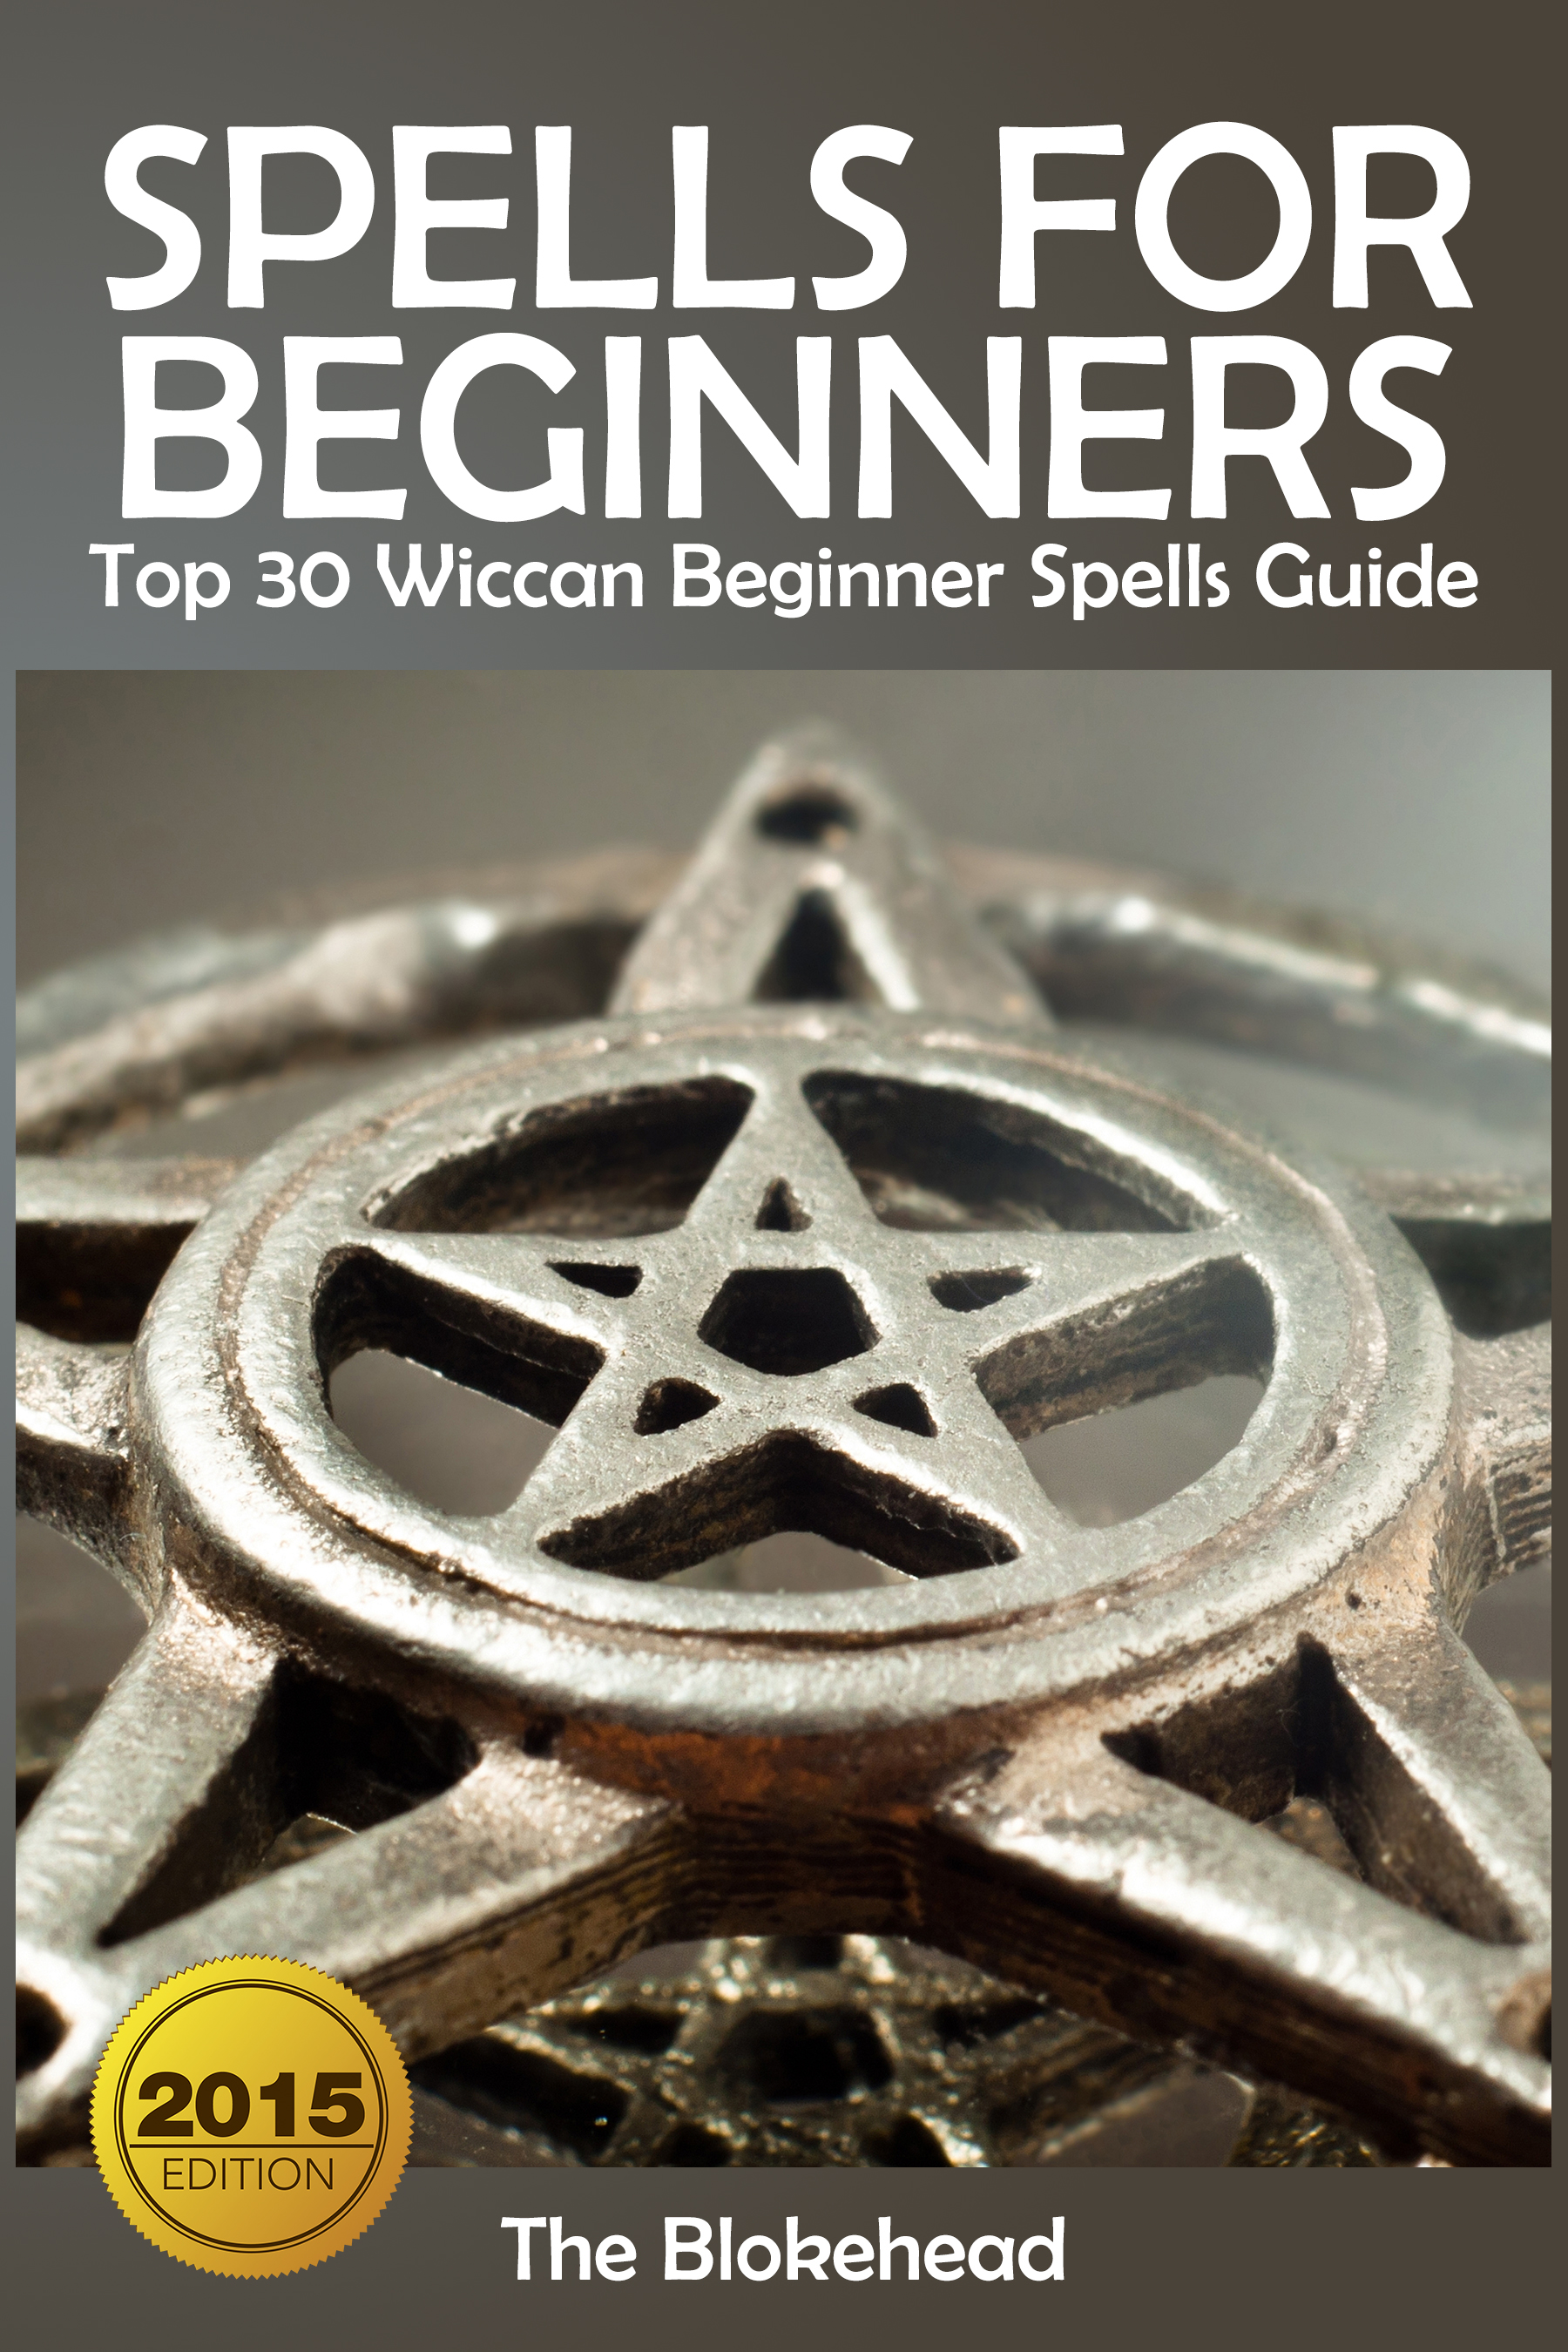 Spells for beginners : top 30 wiccan beginner spells guide